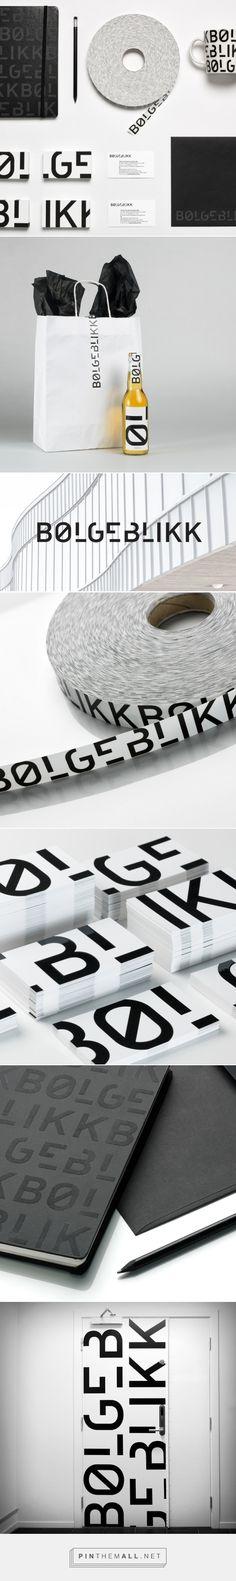 Bølgeblikk - Tank Design branding packaging and more curated by Packaging Diva PD. Who speaks Norwegian : )